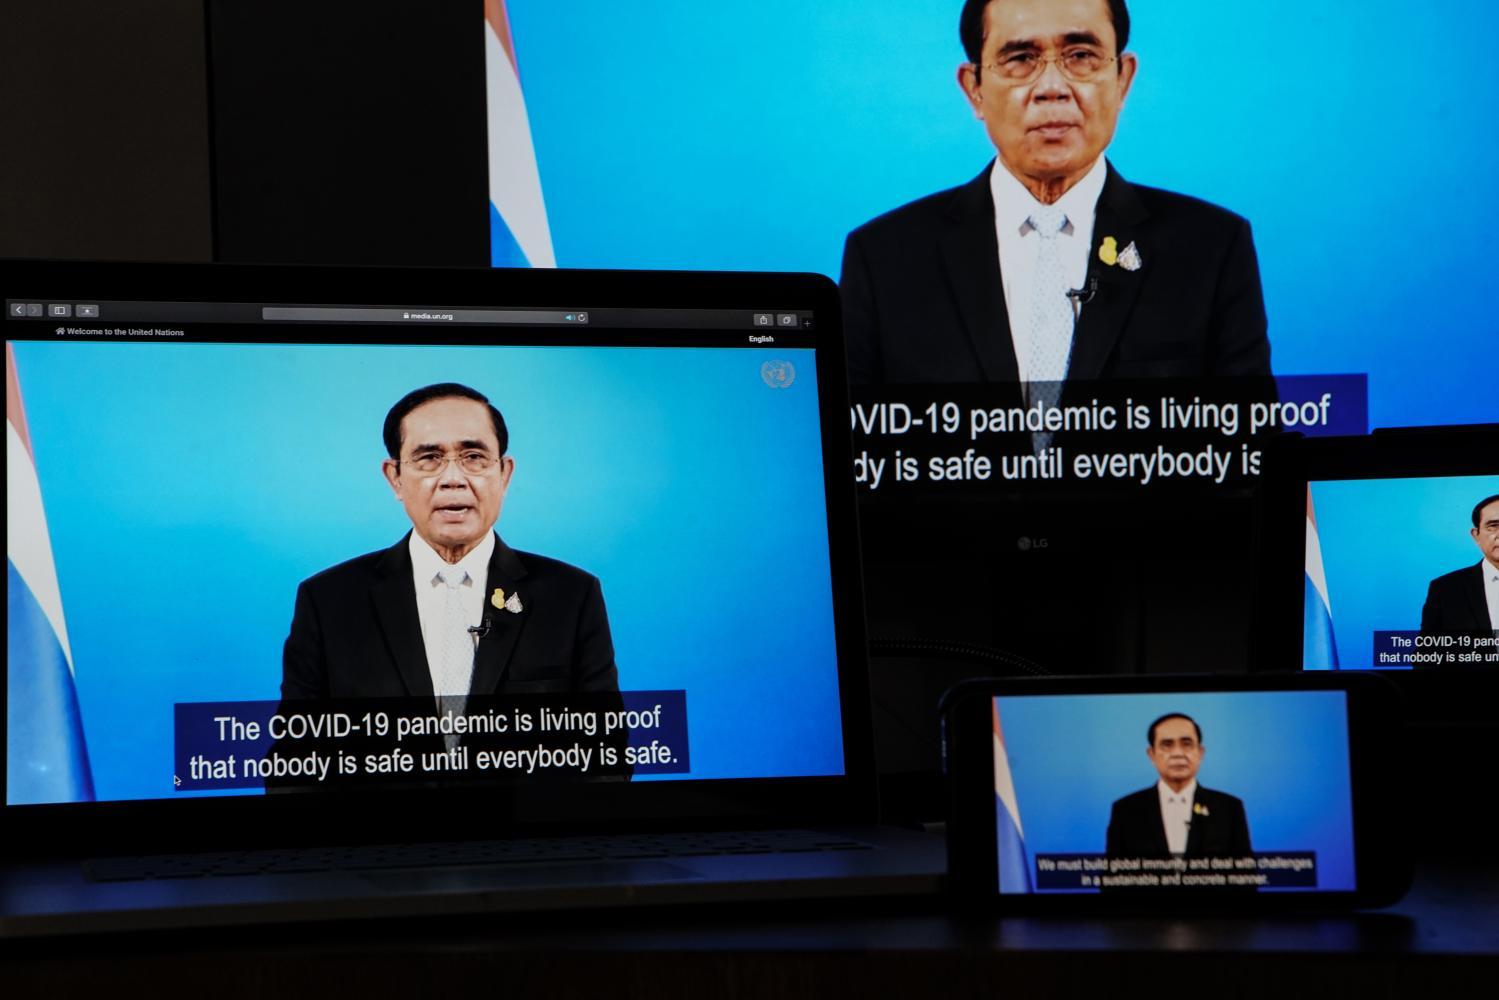 Thailand's 'Next Normal' vision at UN